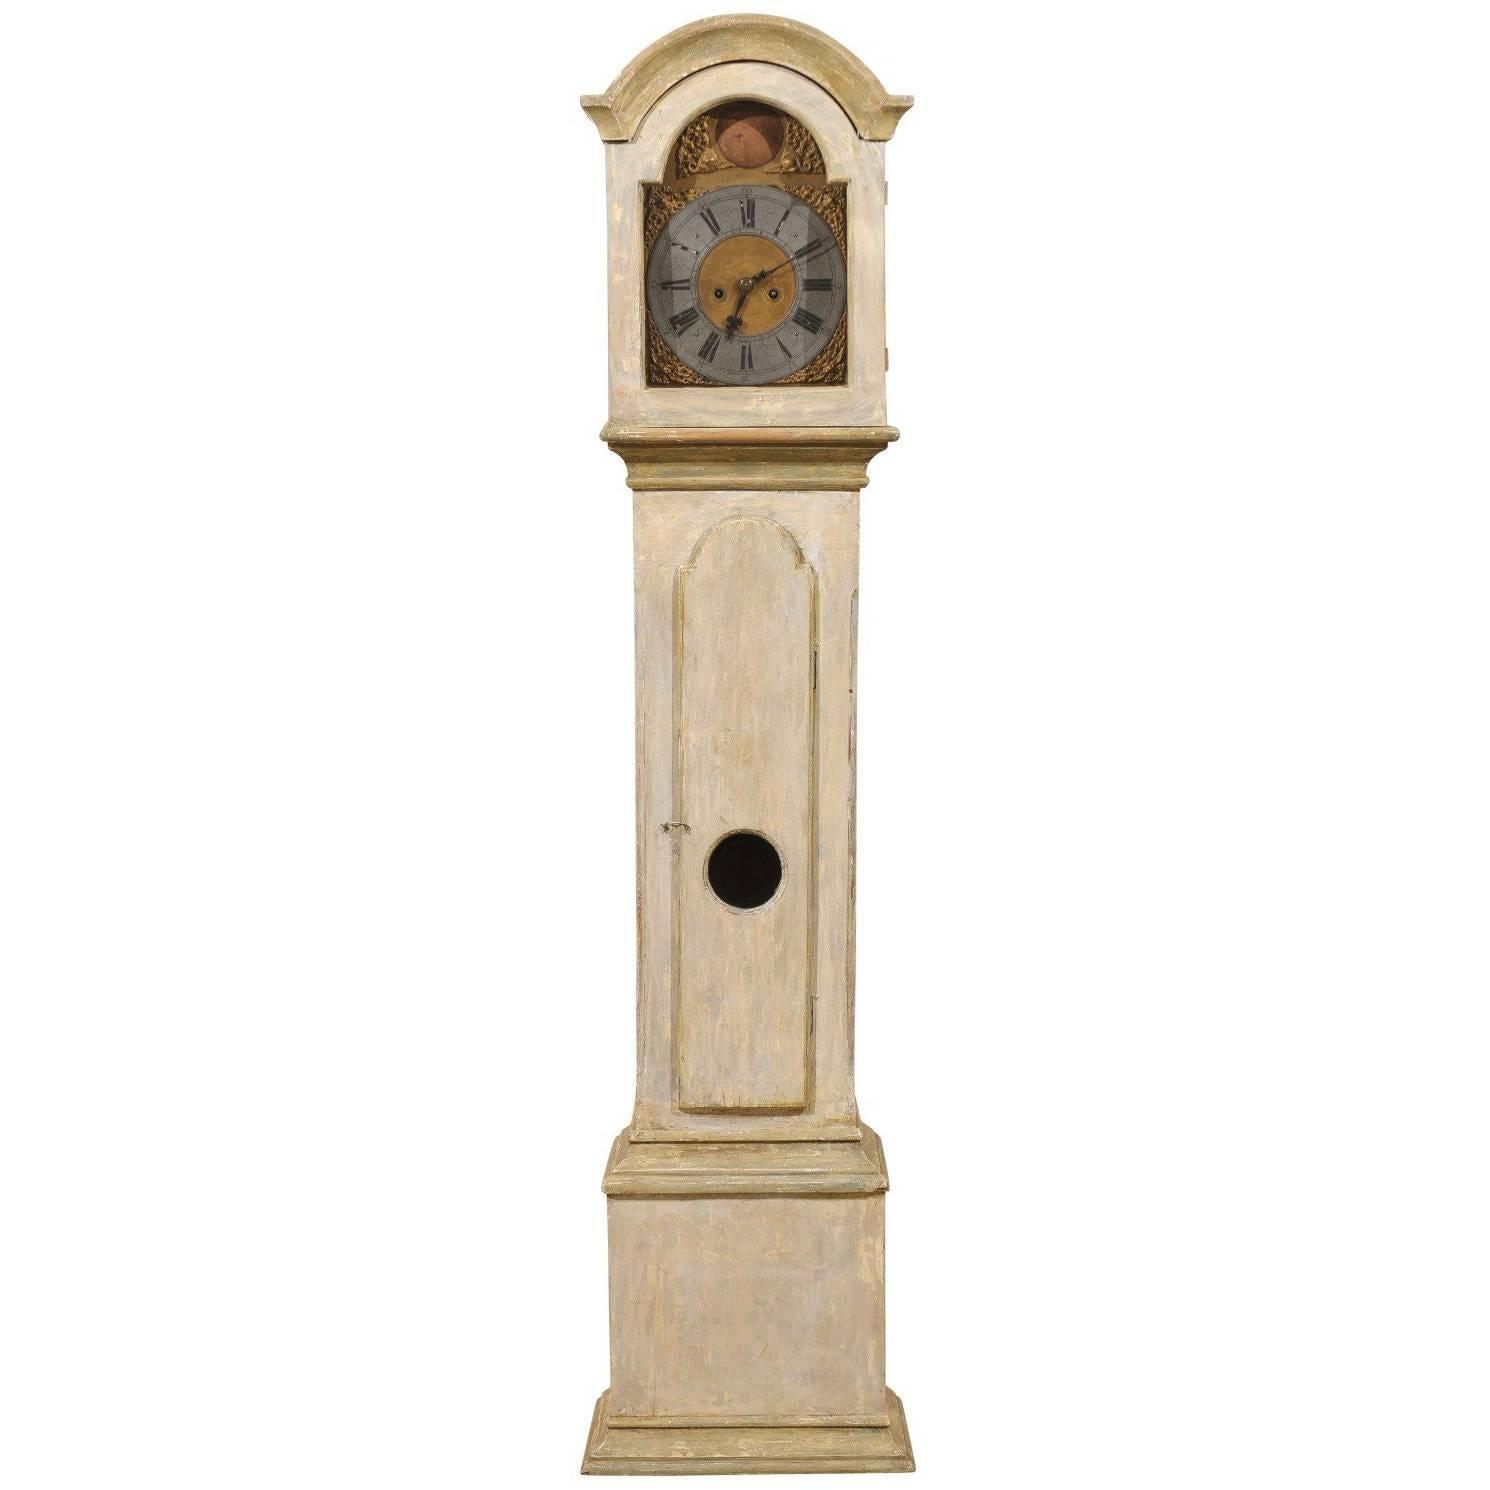 19th C. Swedish Straight Body Floor Clock with Beautiful, Original Gilded Face